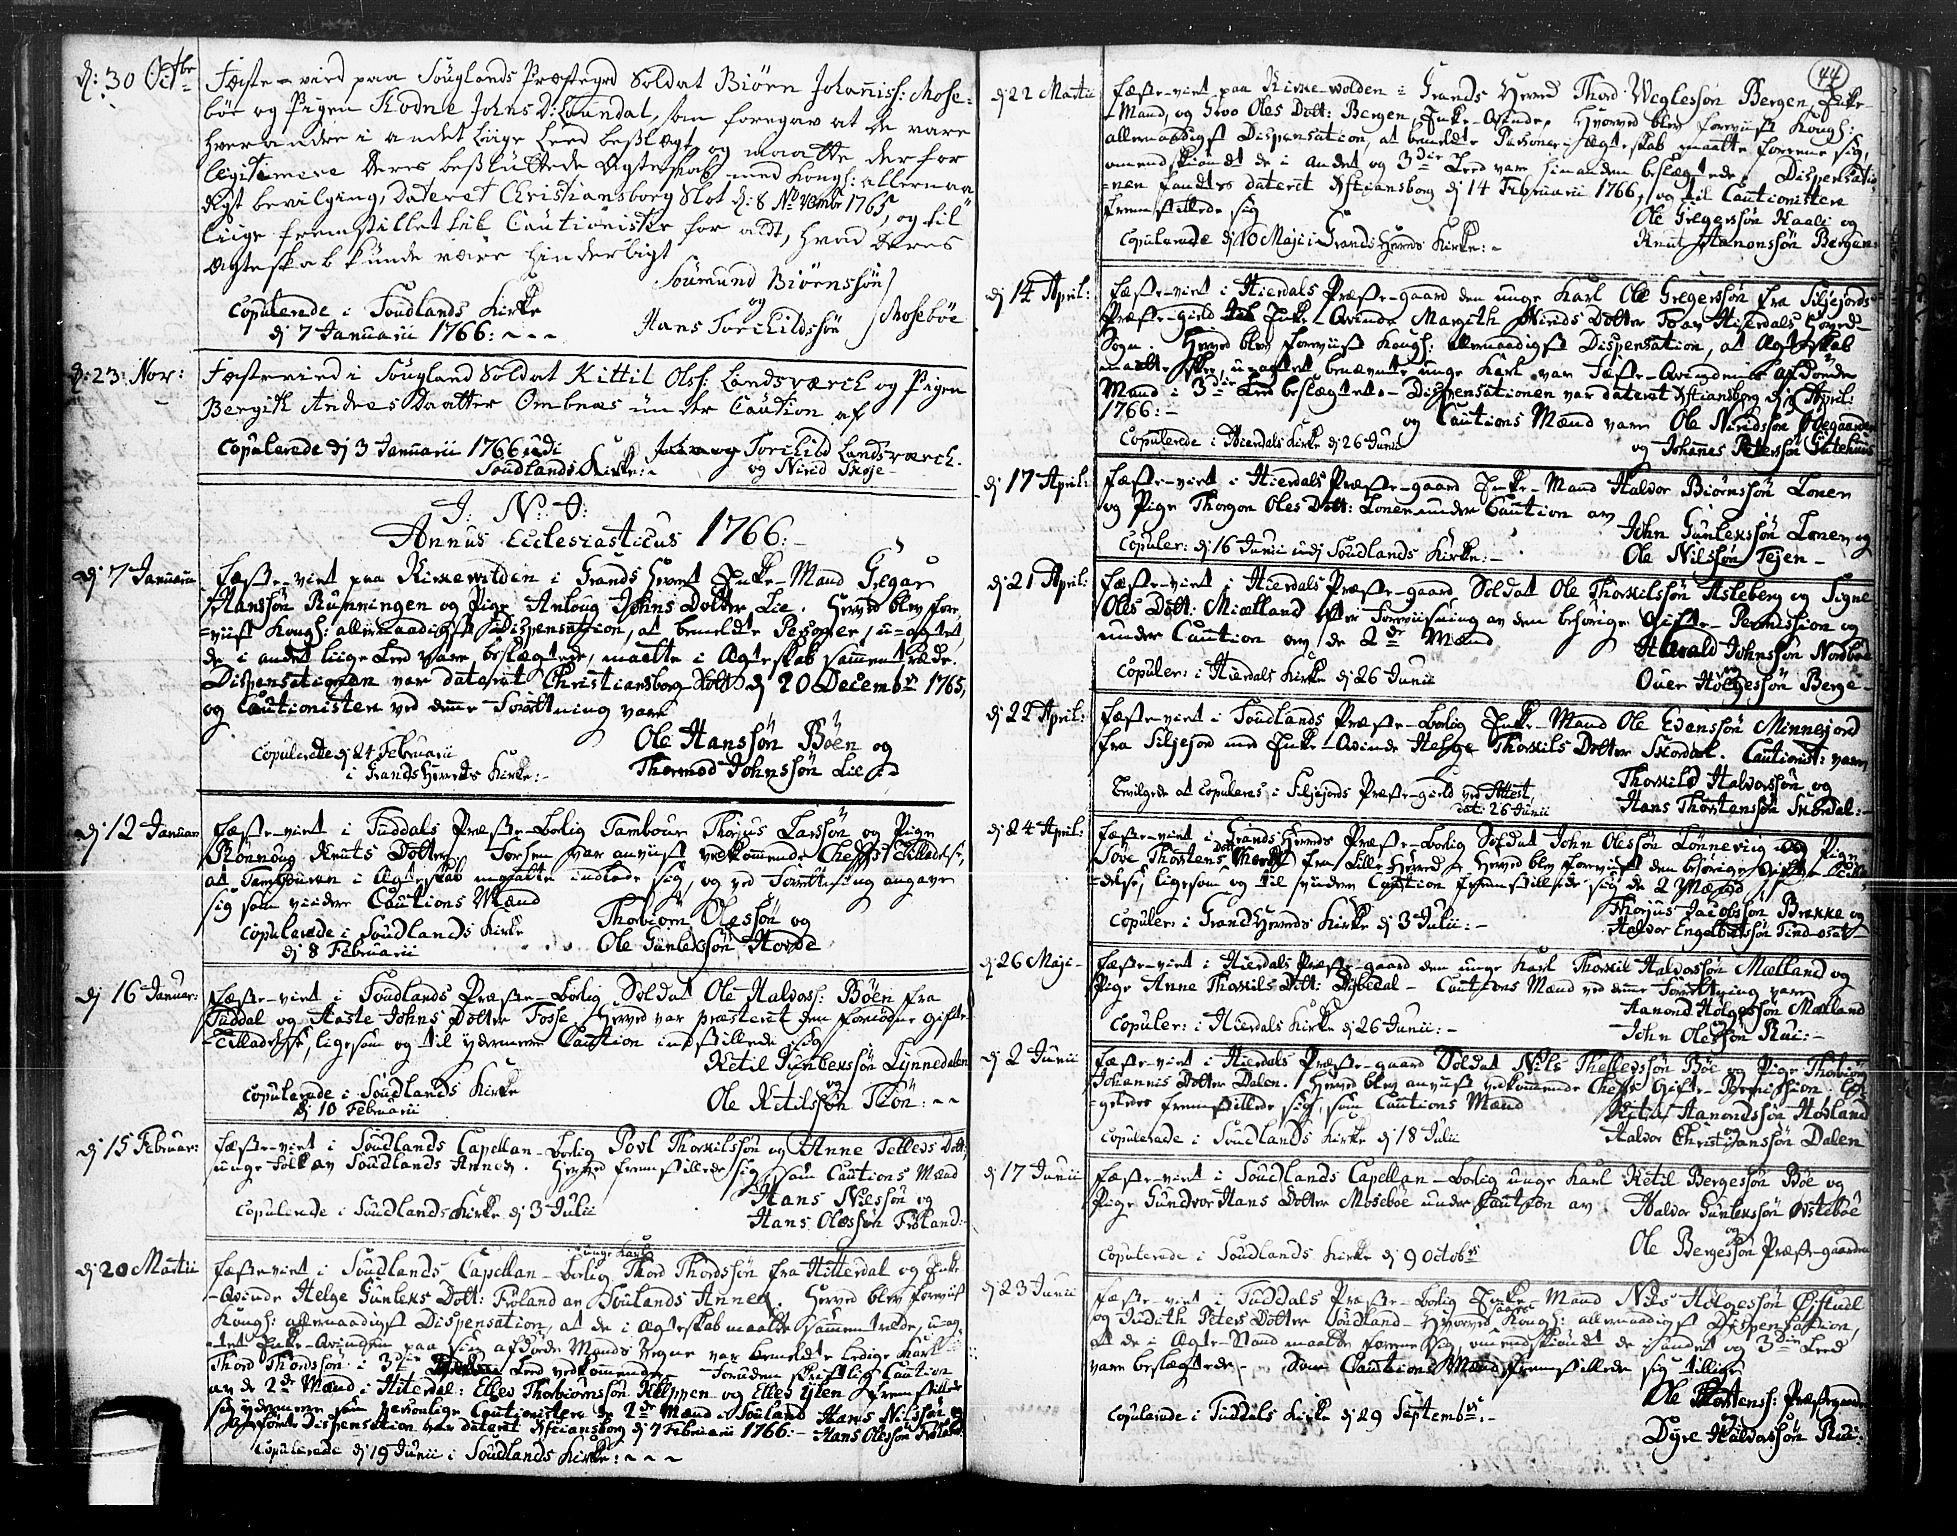 SAKO, Hjartdal kirkebøker, F/Fa/L0004: Ministerialbok nr. I 4, 1727-1795, s. 44